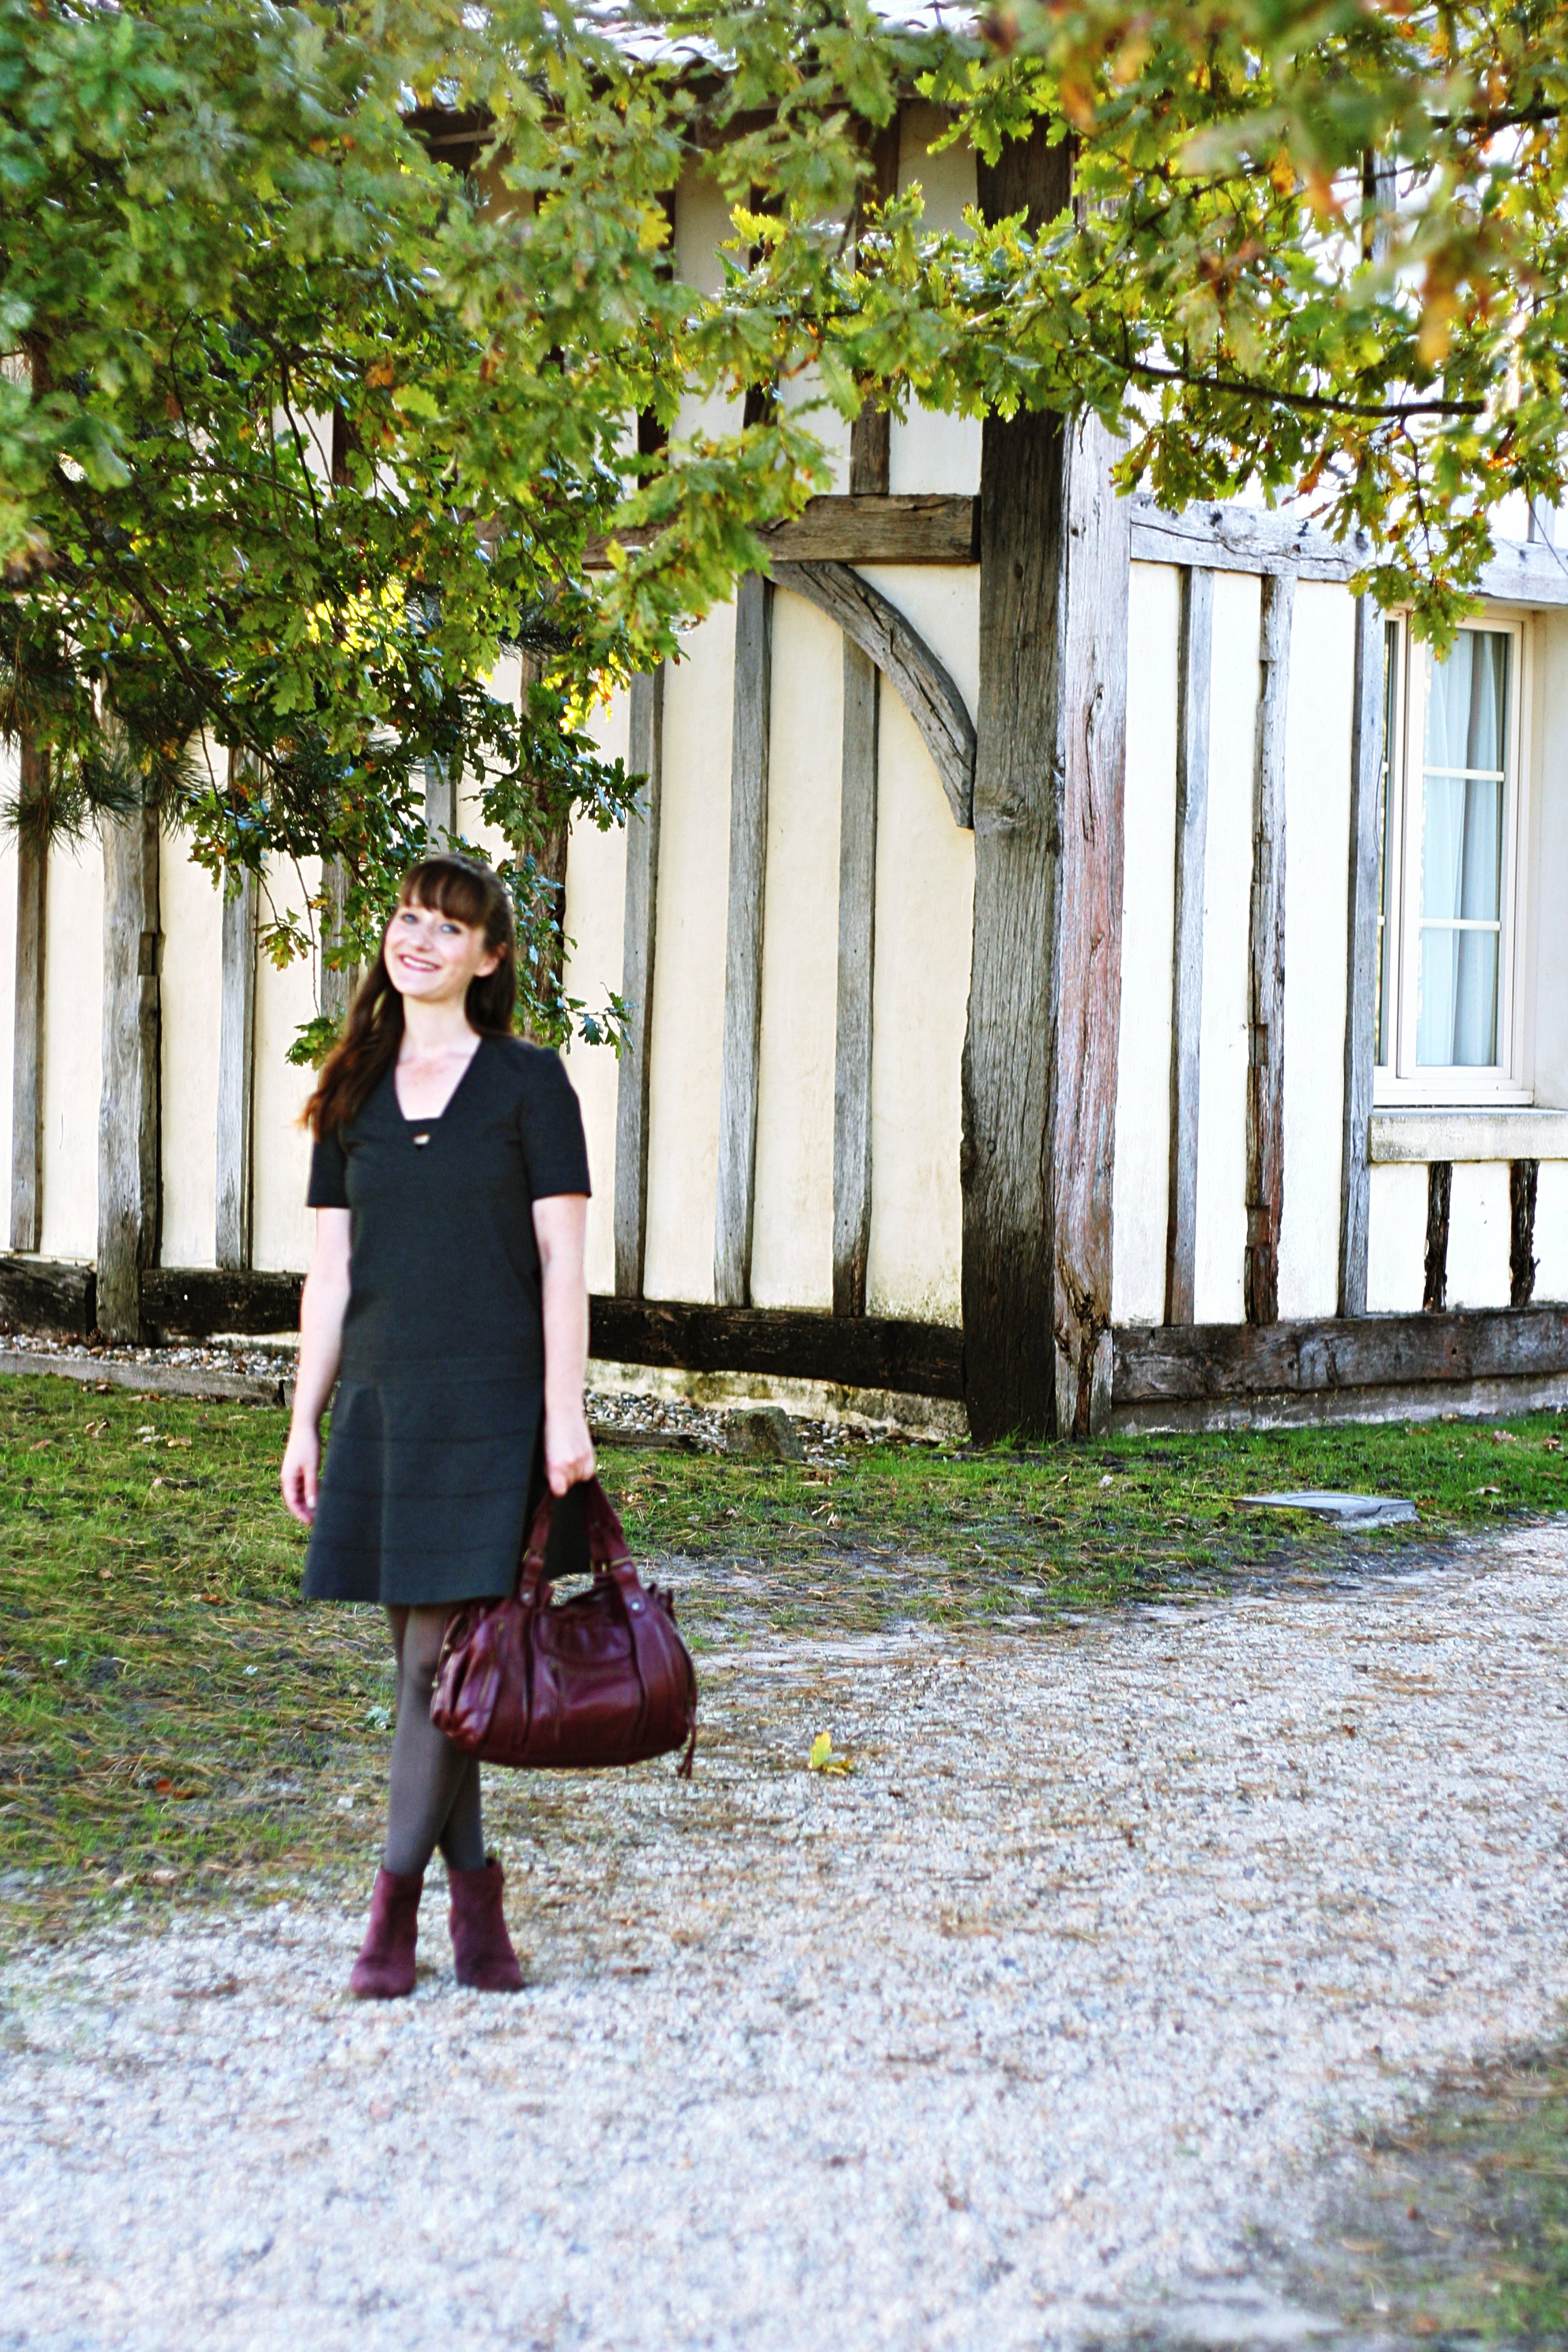 robe comptoir des cotonniers sac gerard darel caudalie sources